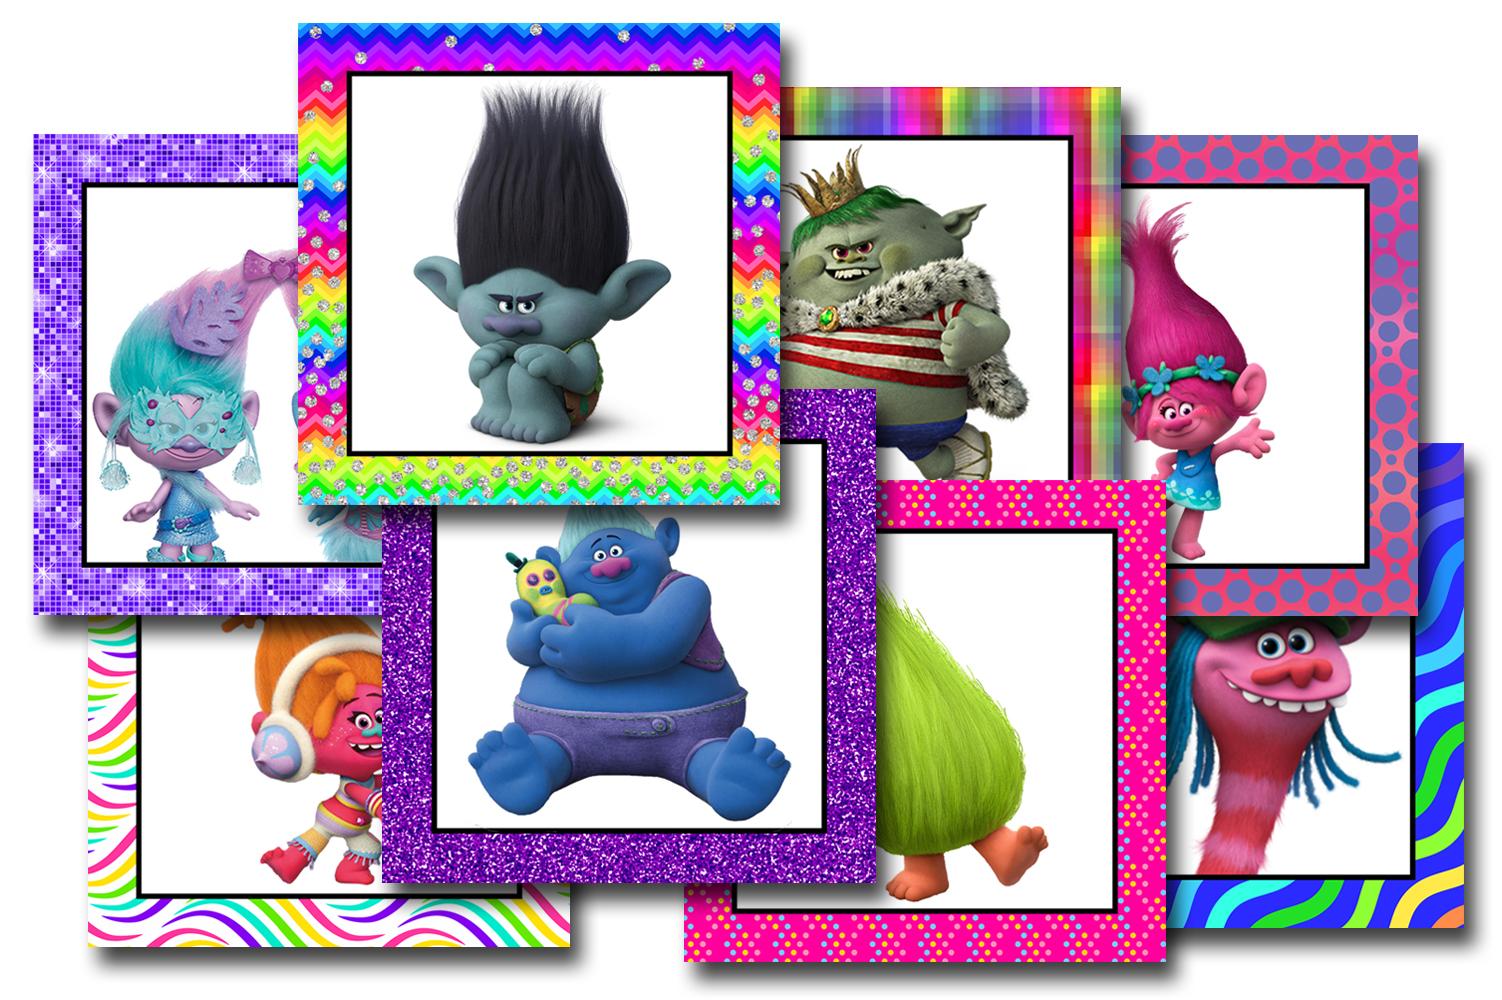 image relating to Trolls Printable named Trolls Cost-free Printable Bingo Playing cards - Trolls Birthday Celebration